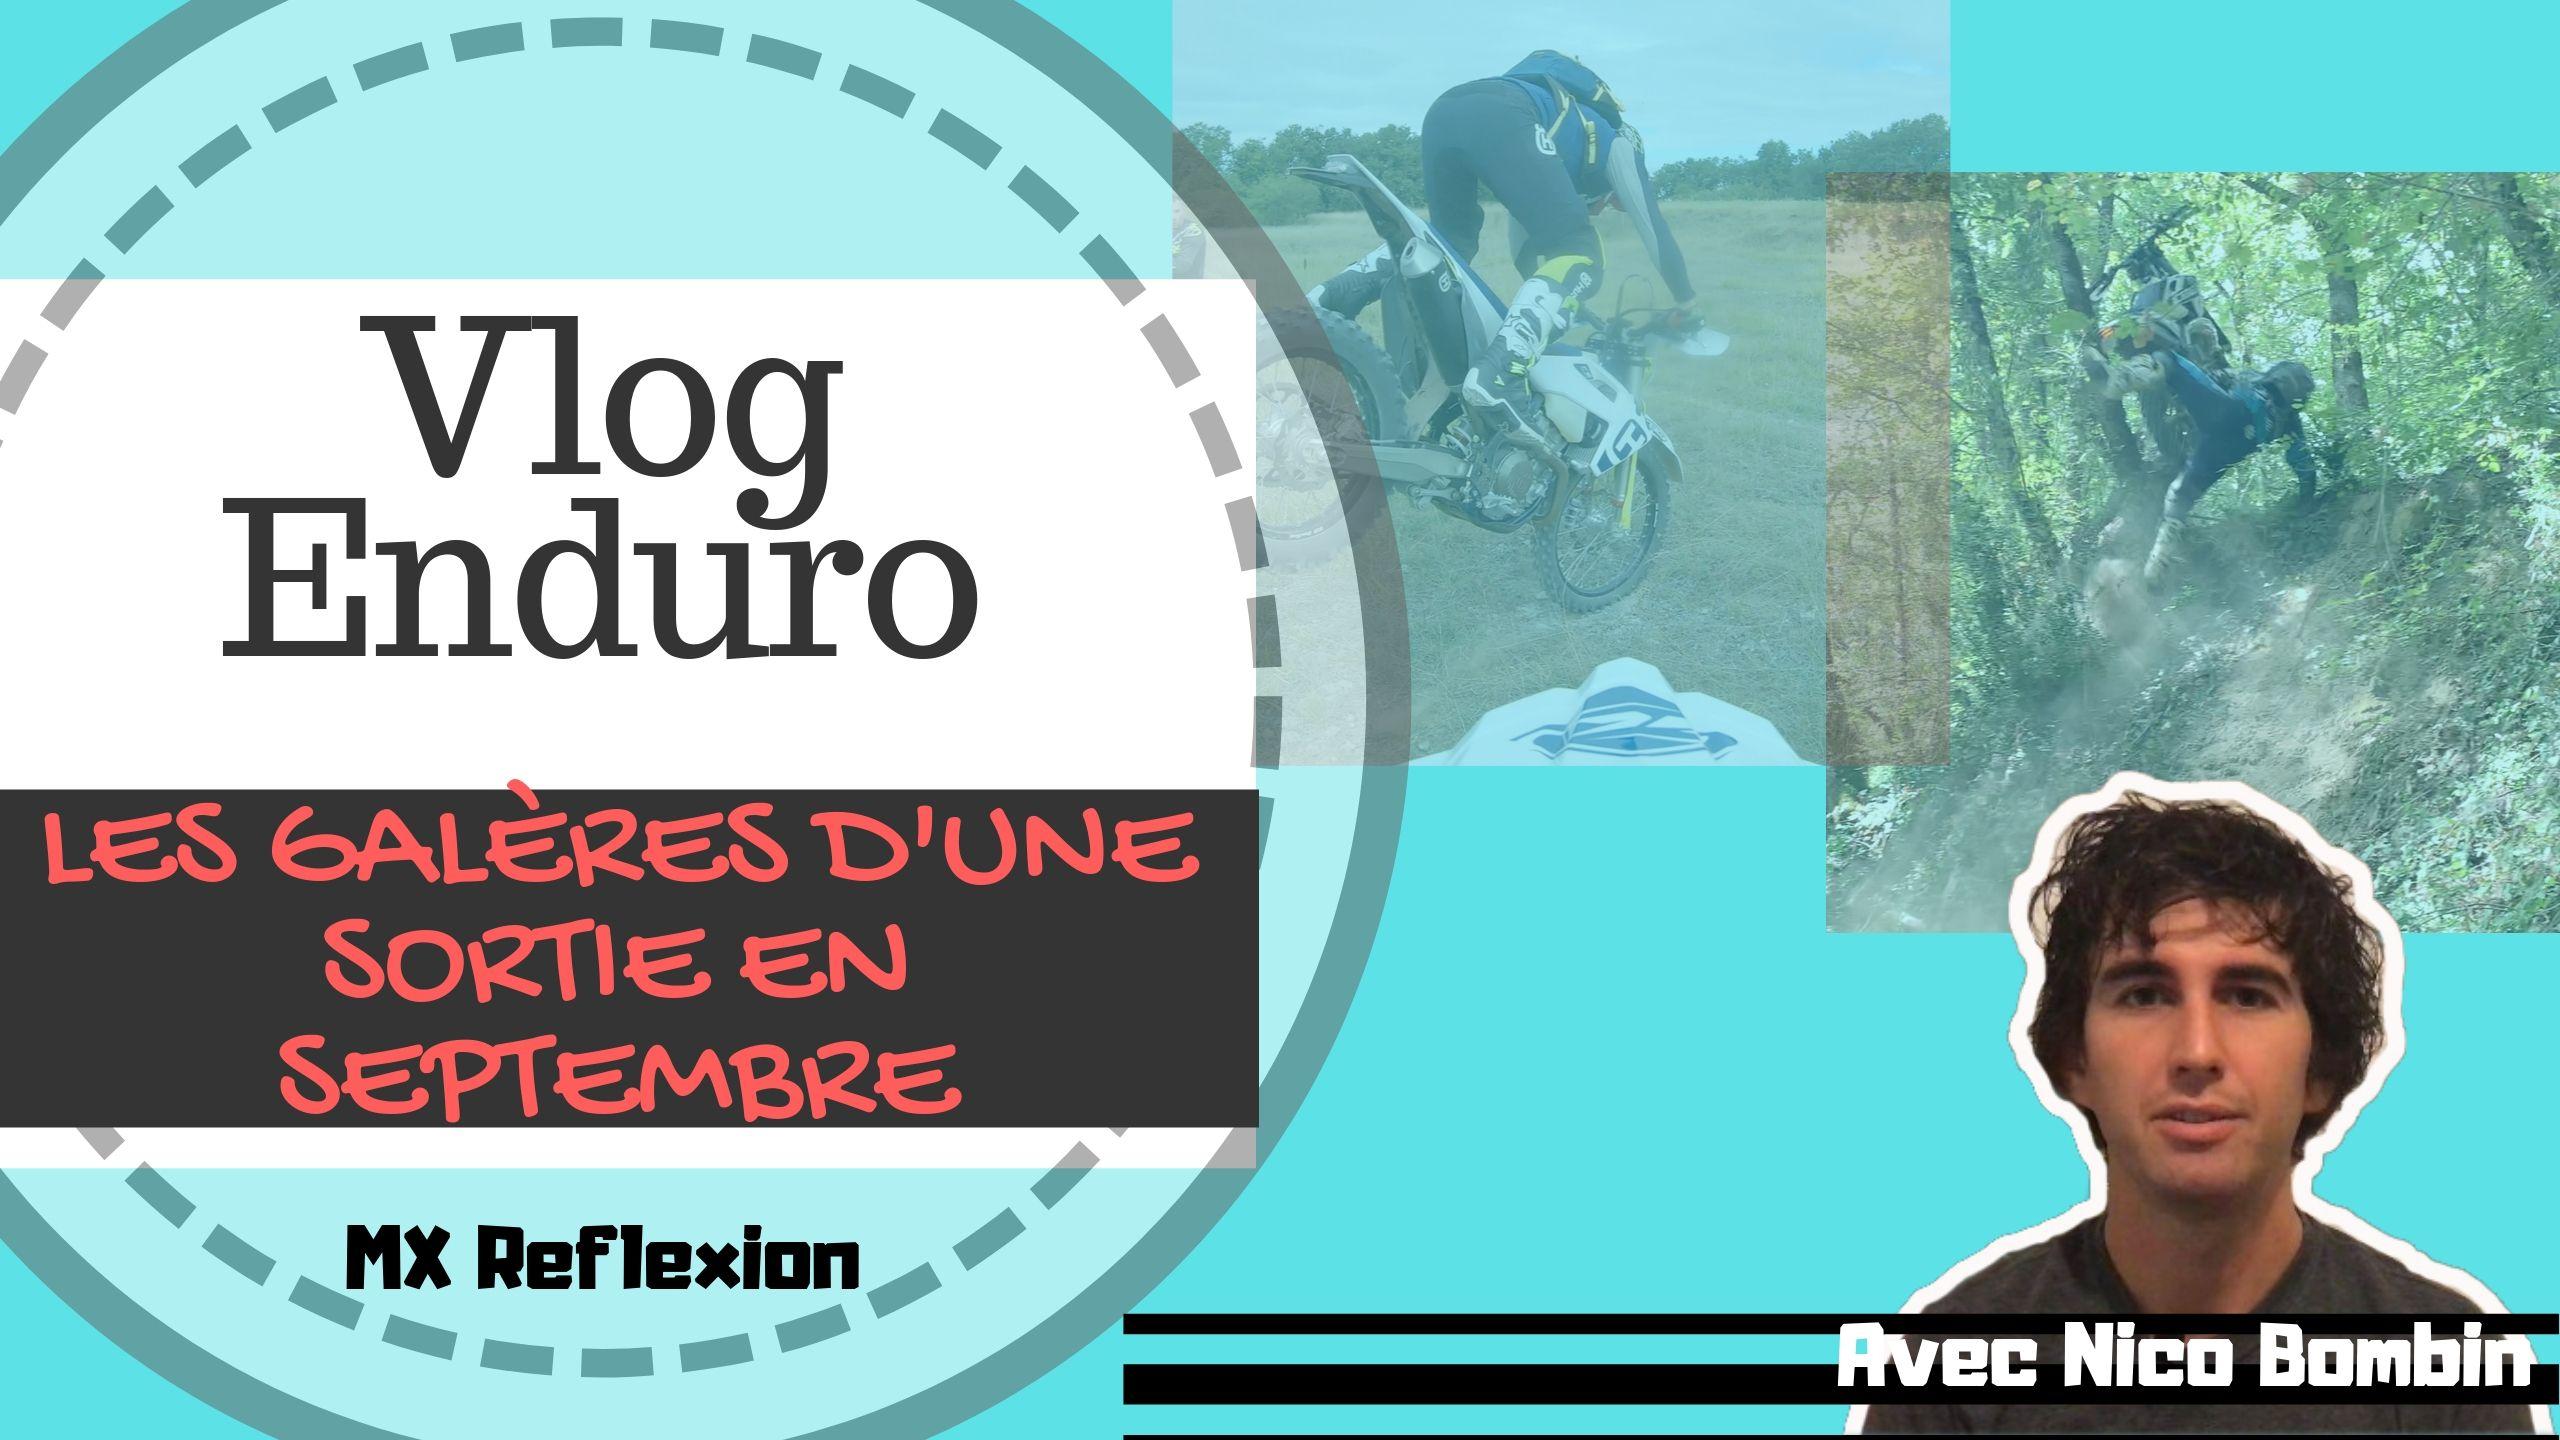 Miniature Vlog Enduro septembre